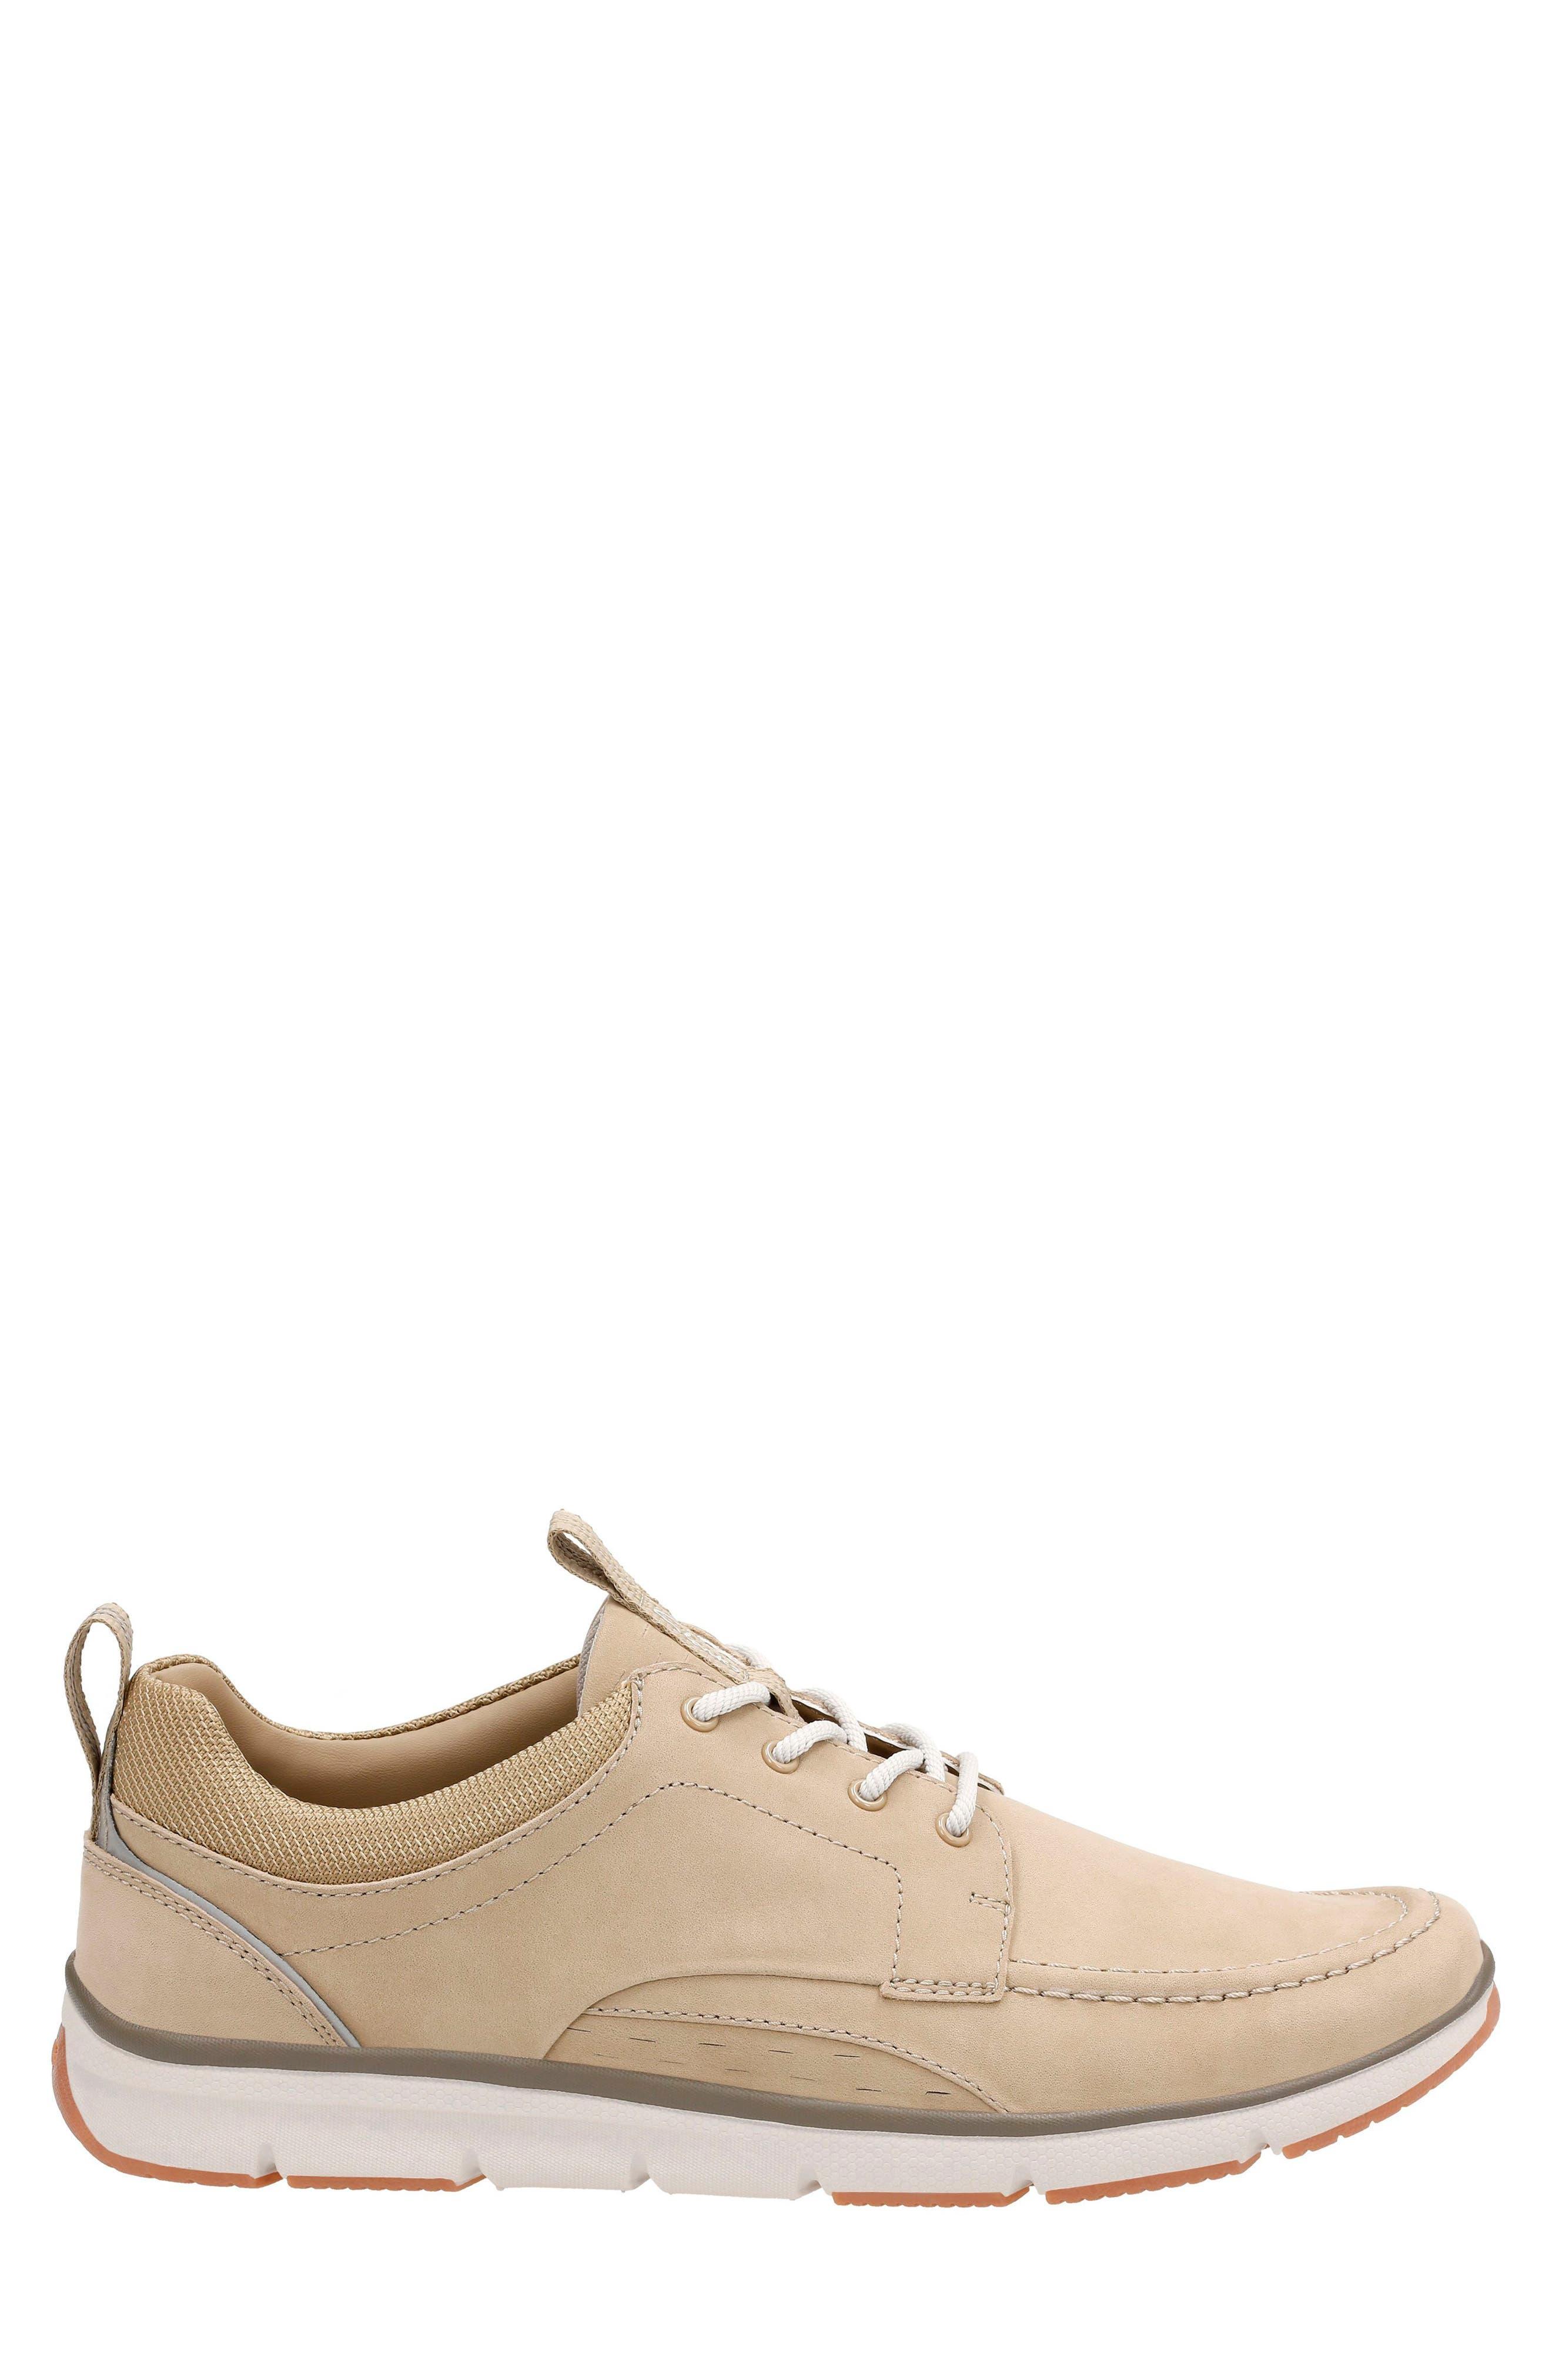 Orson Bay Sneaker,                             Alternate thumbnail 3, color,                             200